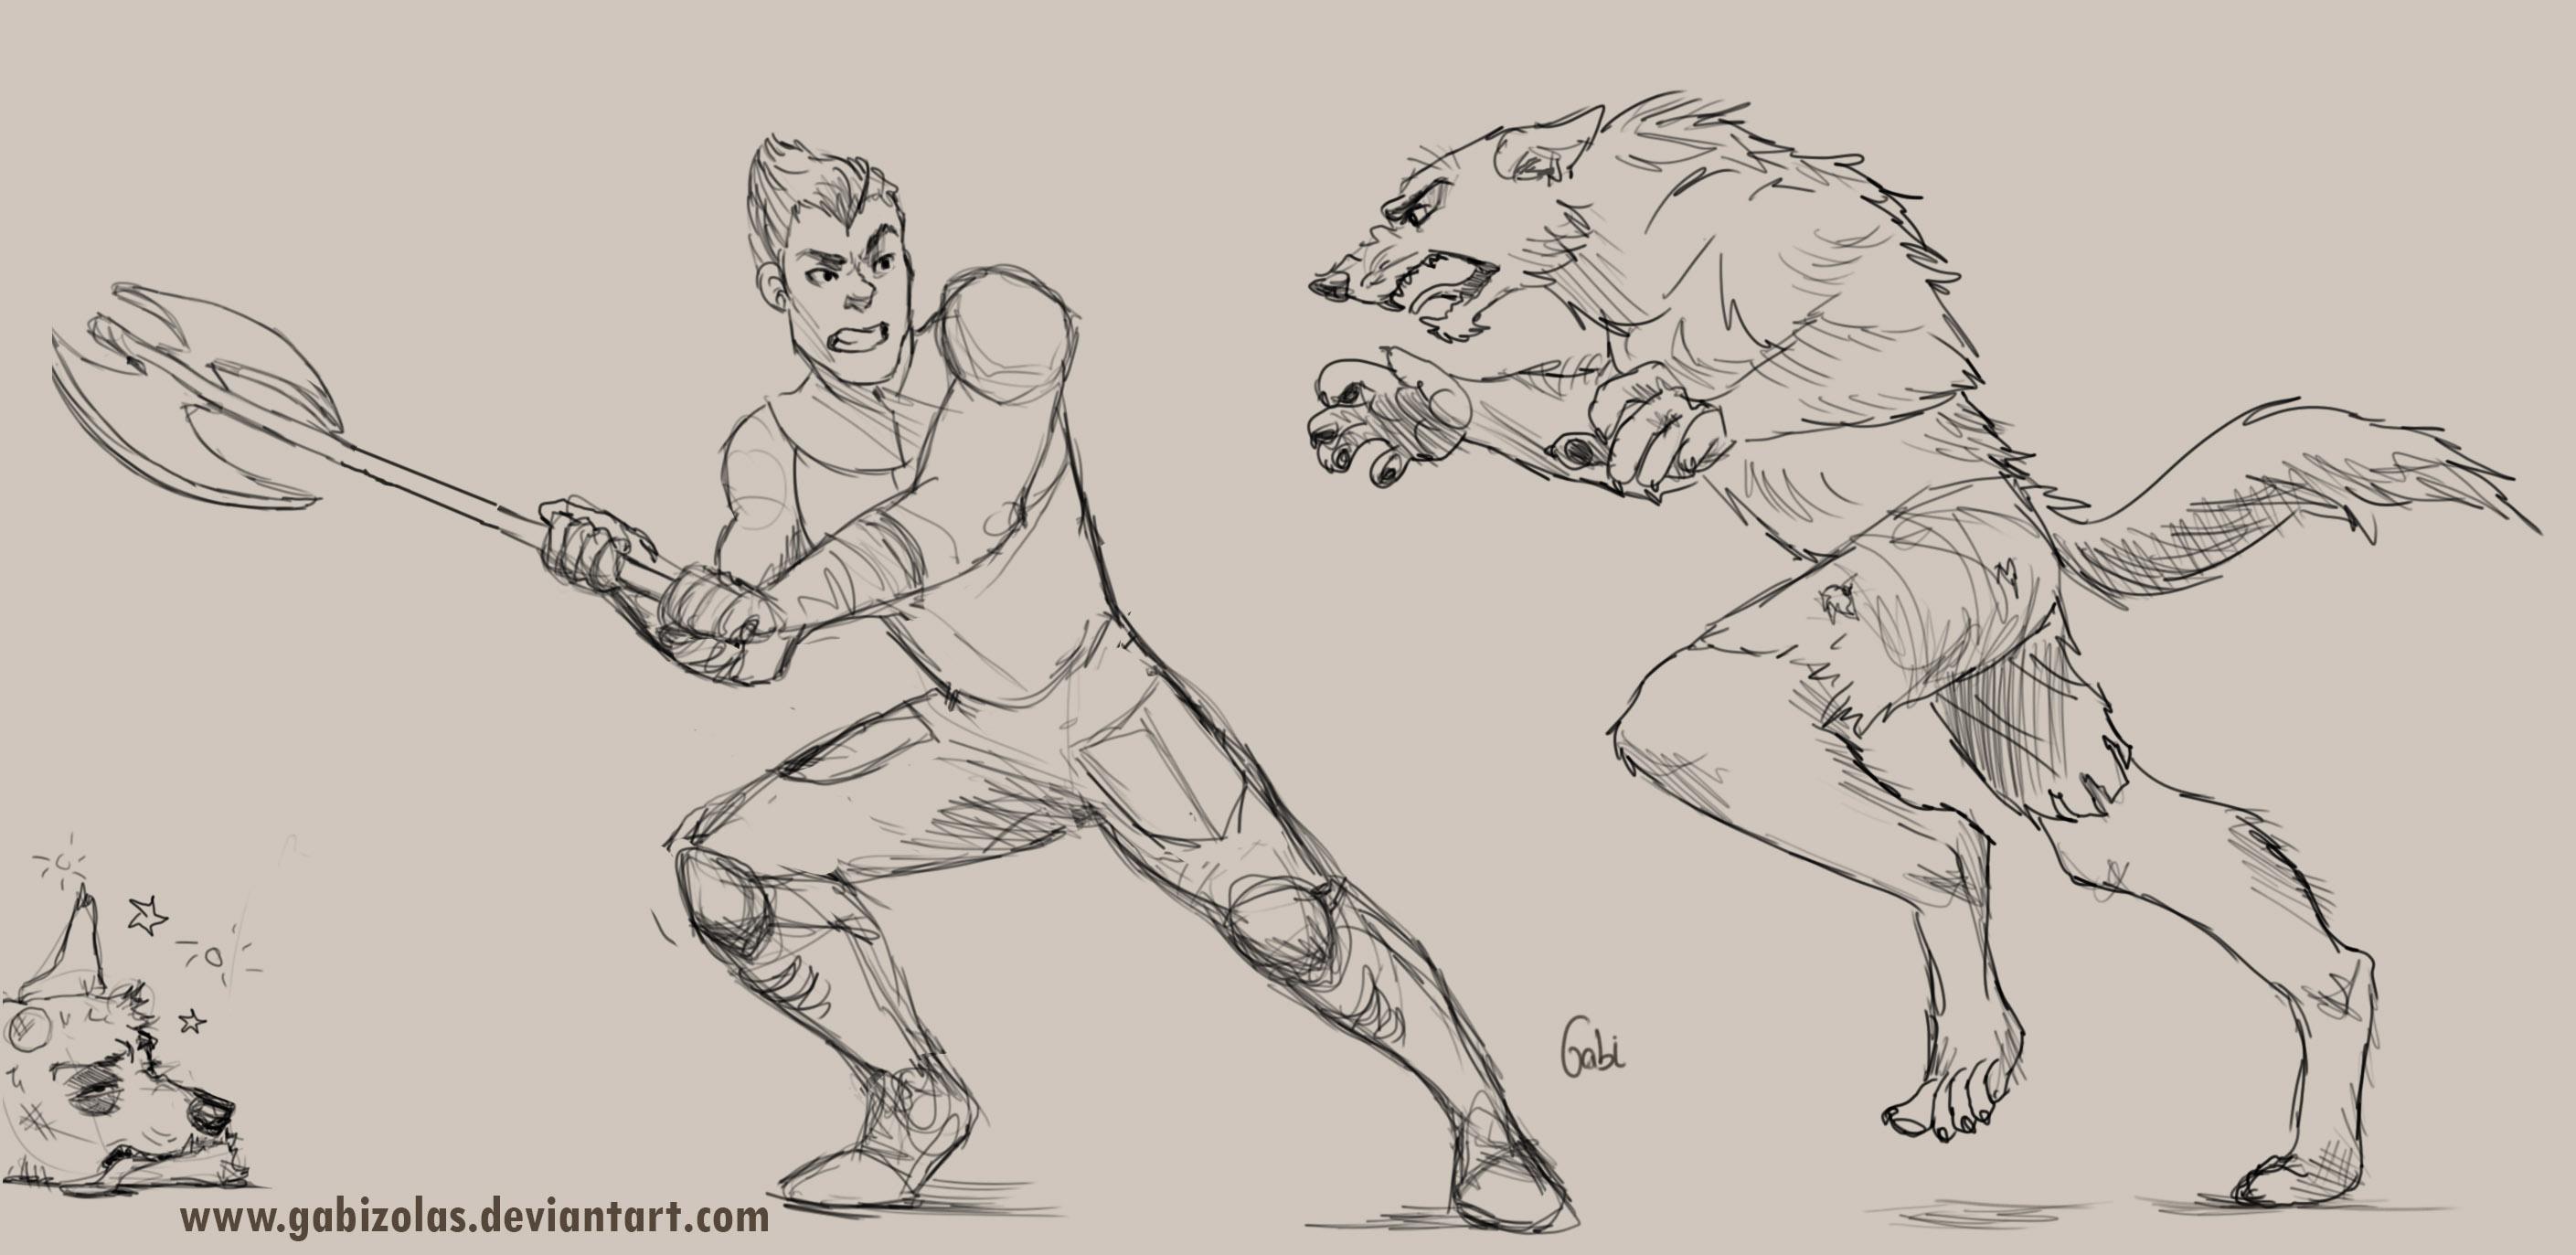 Request: Axel fighting Werewolves by Gabizolas